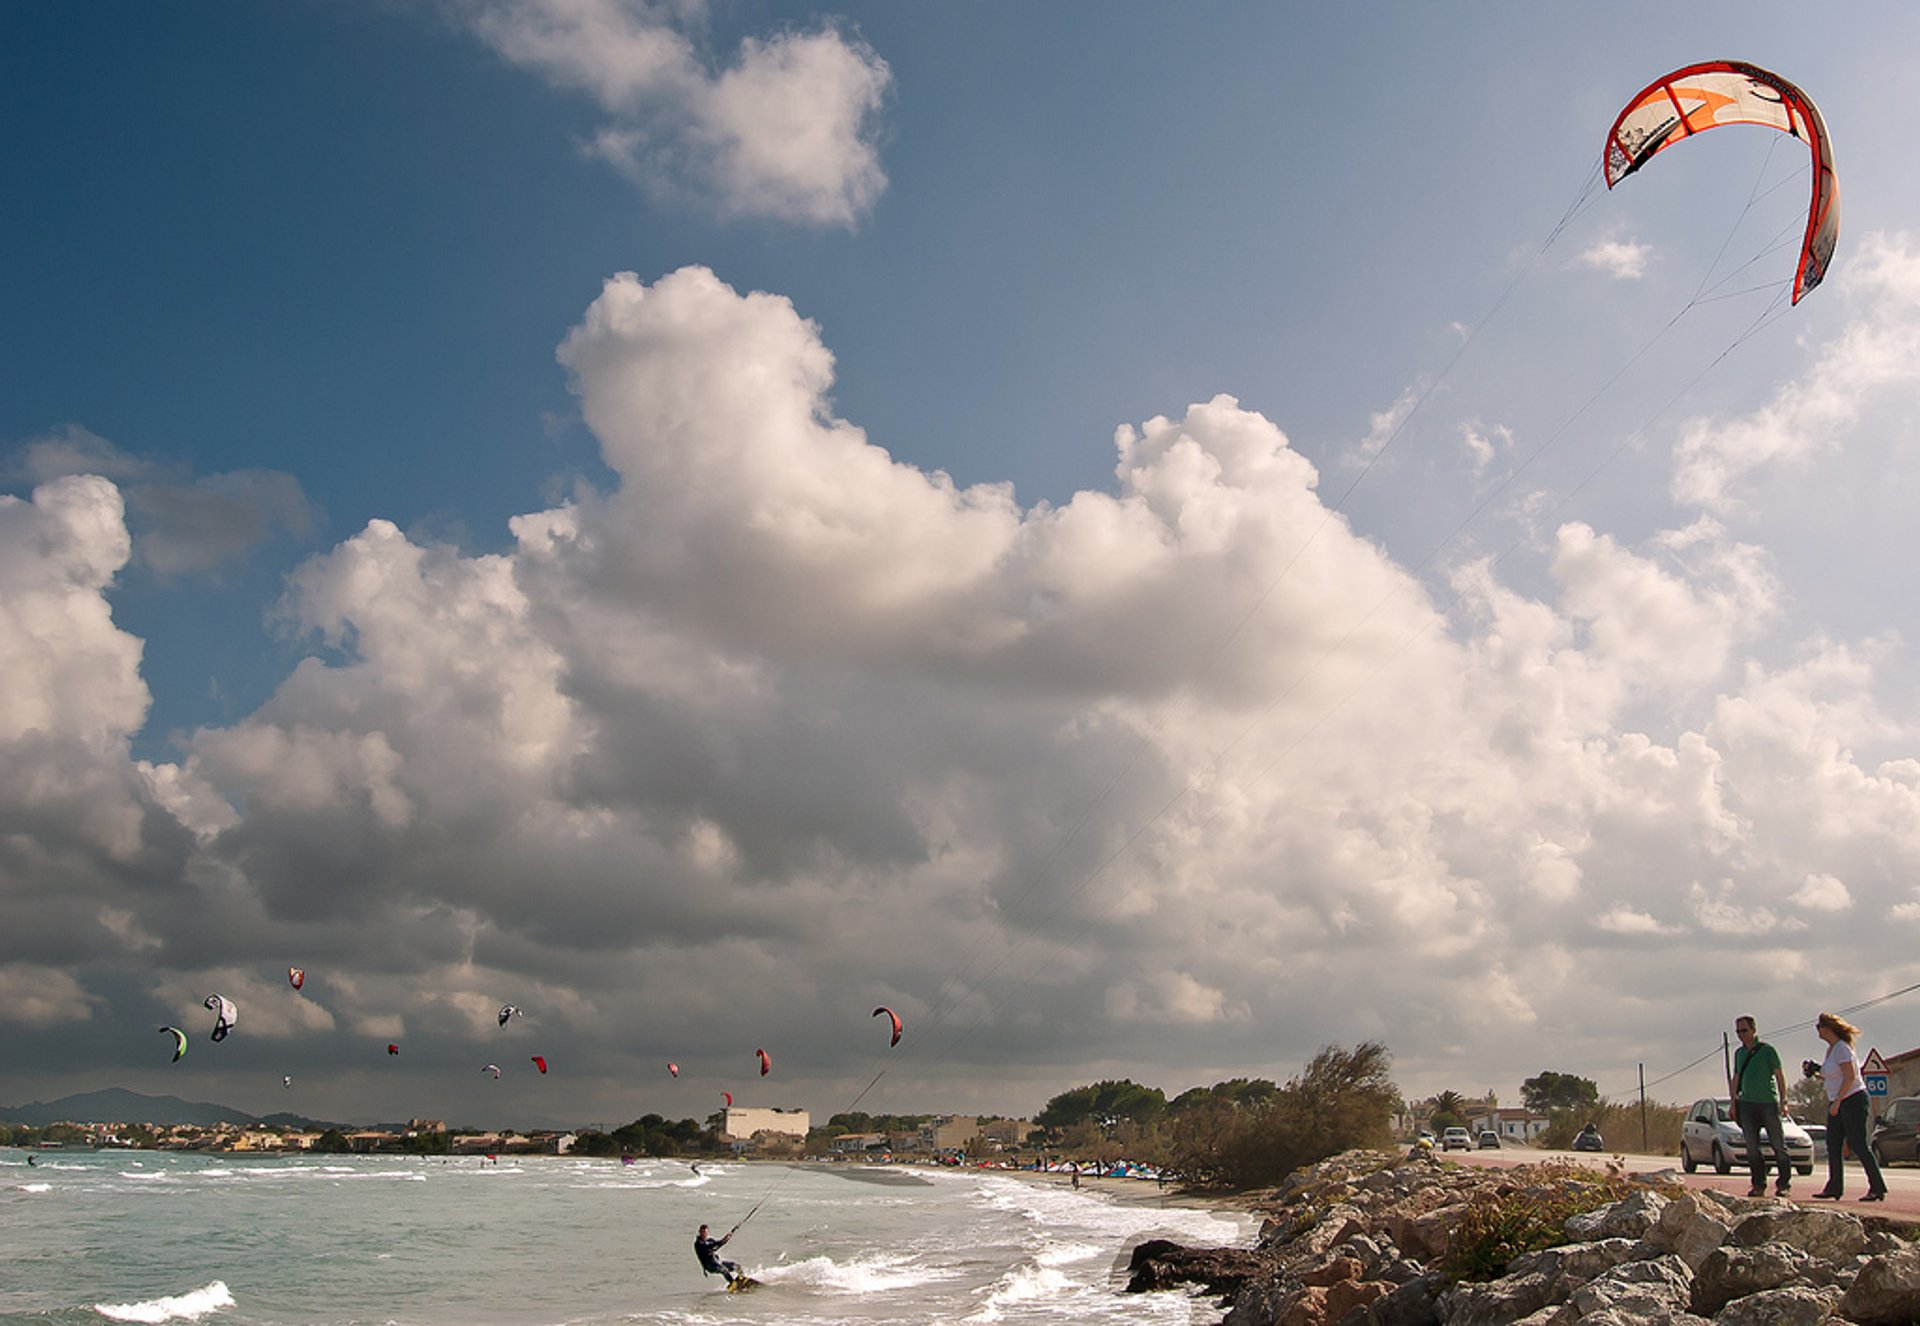 Kitesurf en Bahía Club (Alcudia, Mallorca) 2020